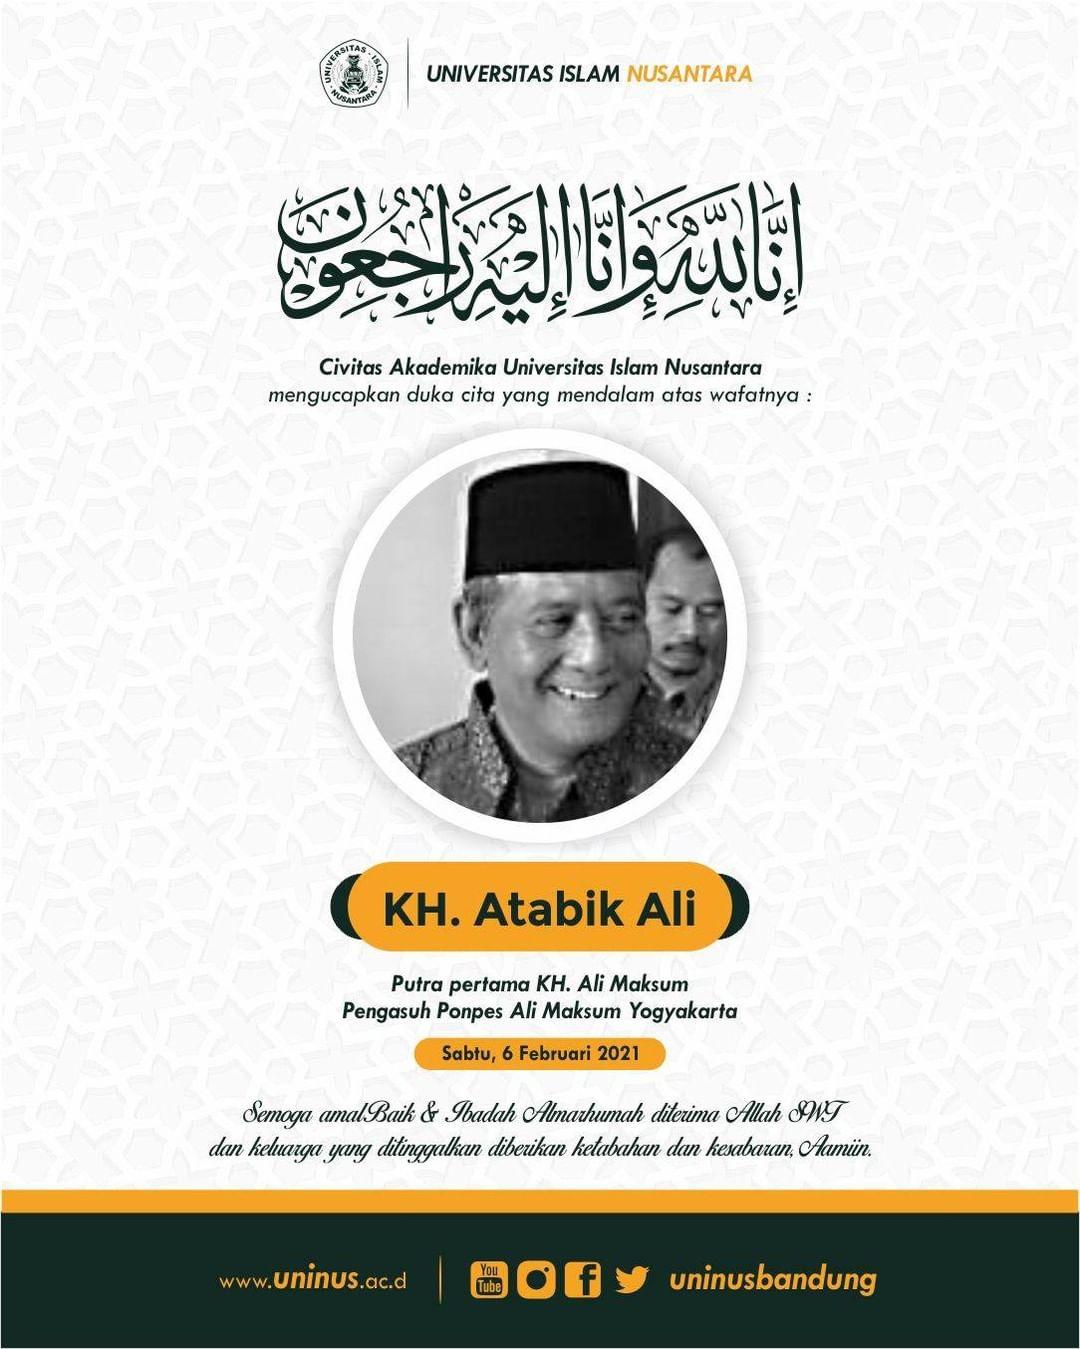 Duka Cita Yang Mendalam Kami Sampaikan Untuk KH. Atabik Ali (Putra Pertama KH. A…